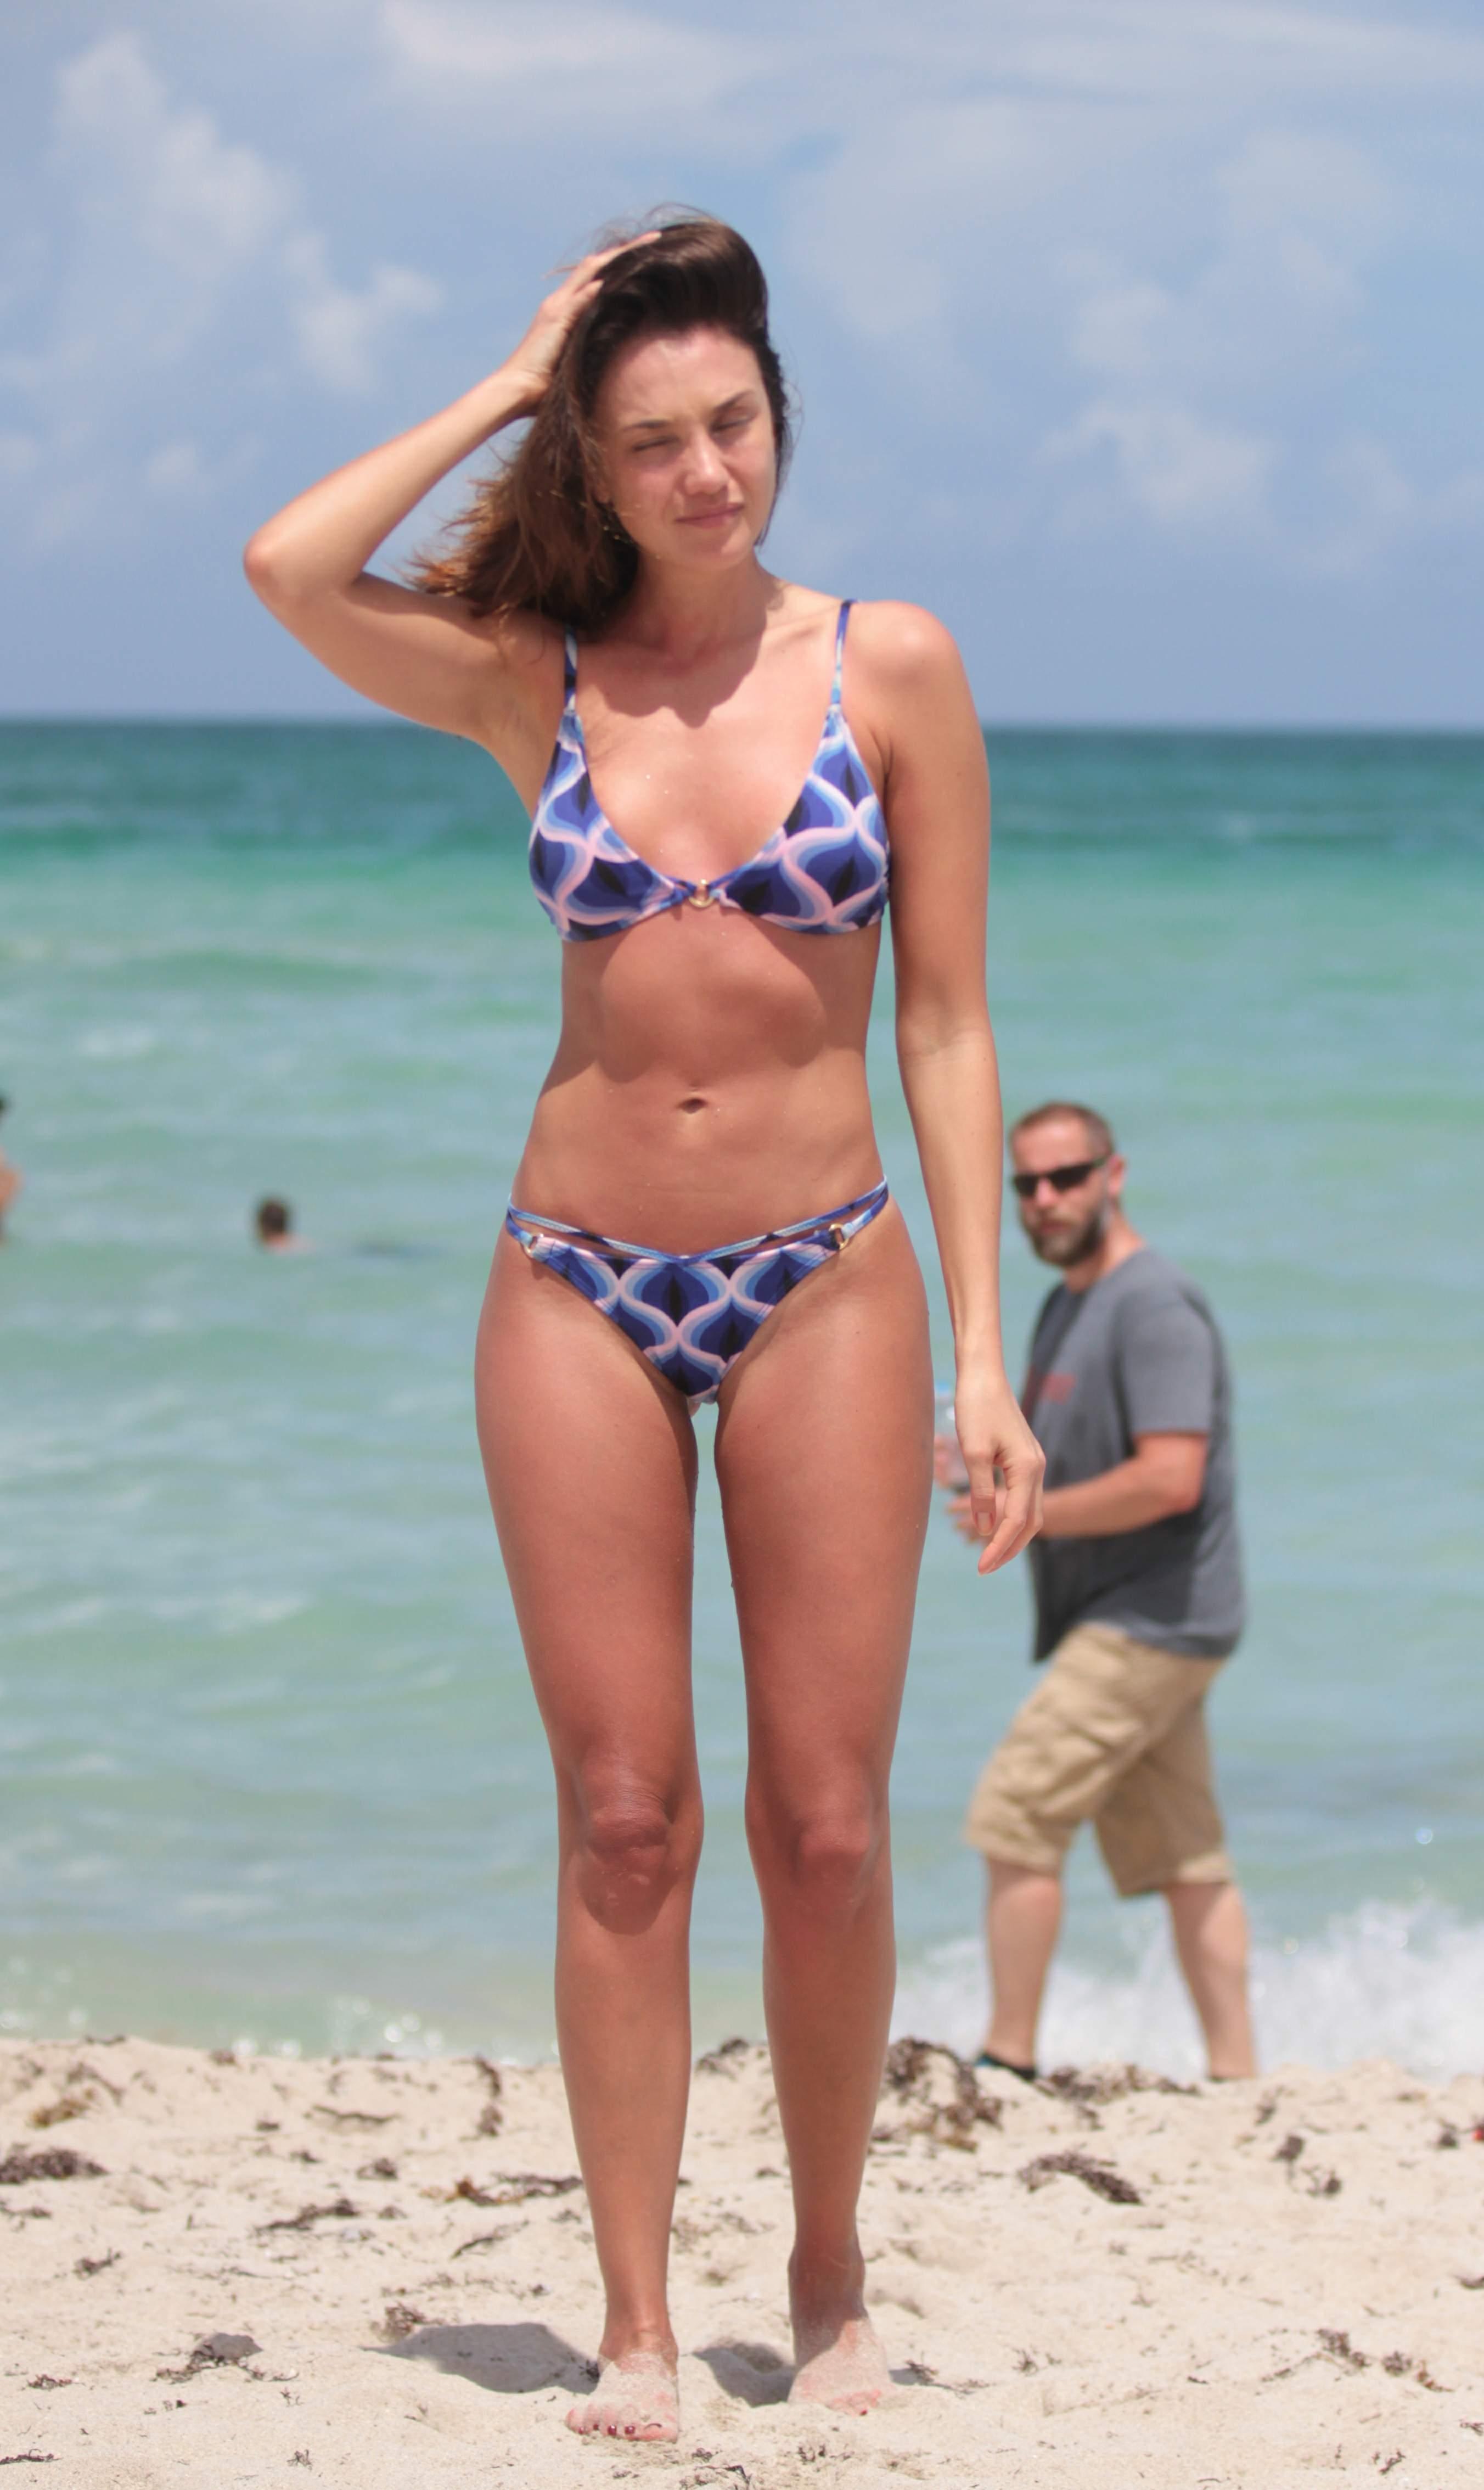 Porno Michelle Fedalto nude (83 photo), Topless, Hot, Boobs, braless 2015